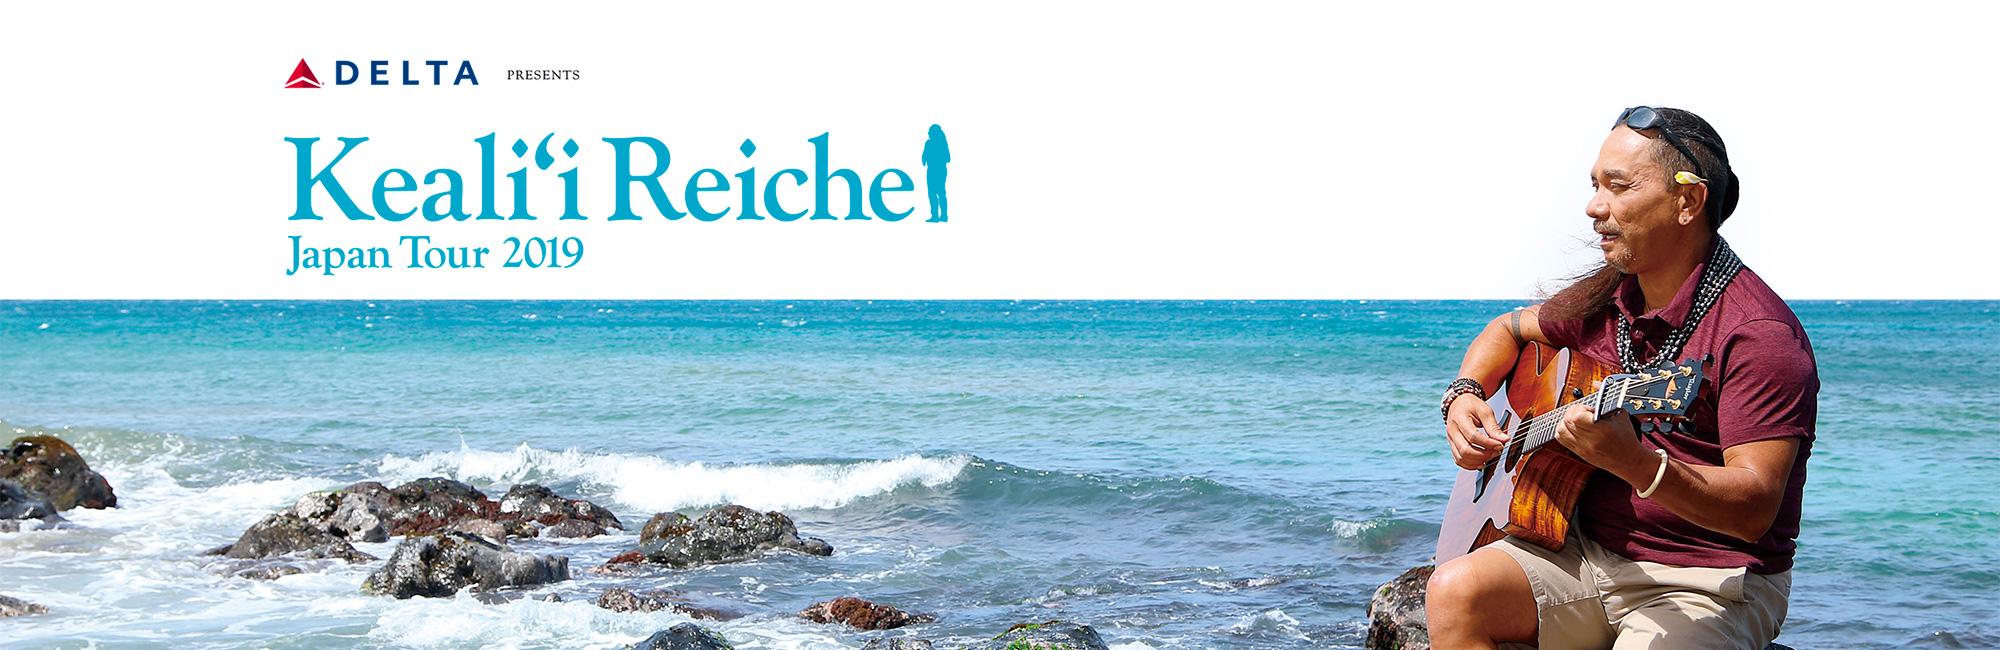 Kealii Reichell Japan Tour 2019(ケアリイ・レイシェル ジャパンツアー2019)